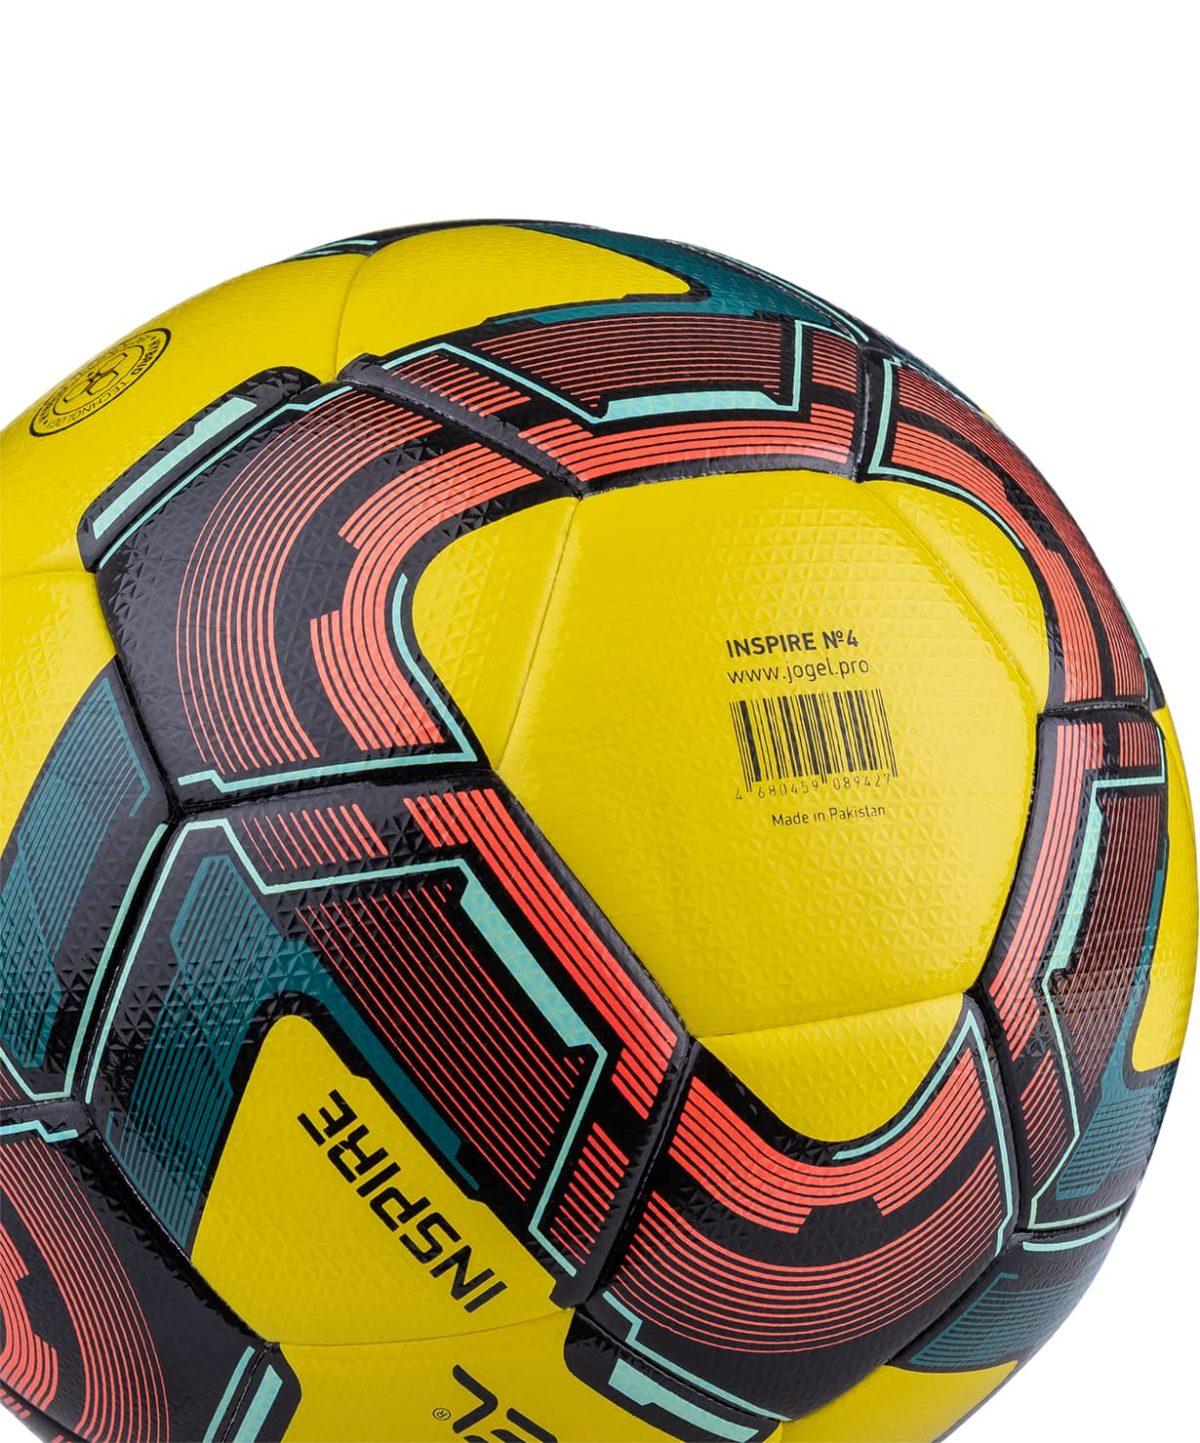 JOGEL Мяч футзальный Inspire  Inspire №4 (ВС20): жёлтый - 5